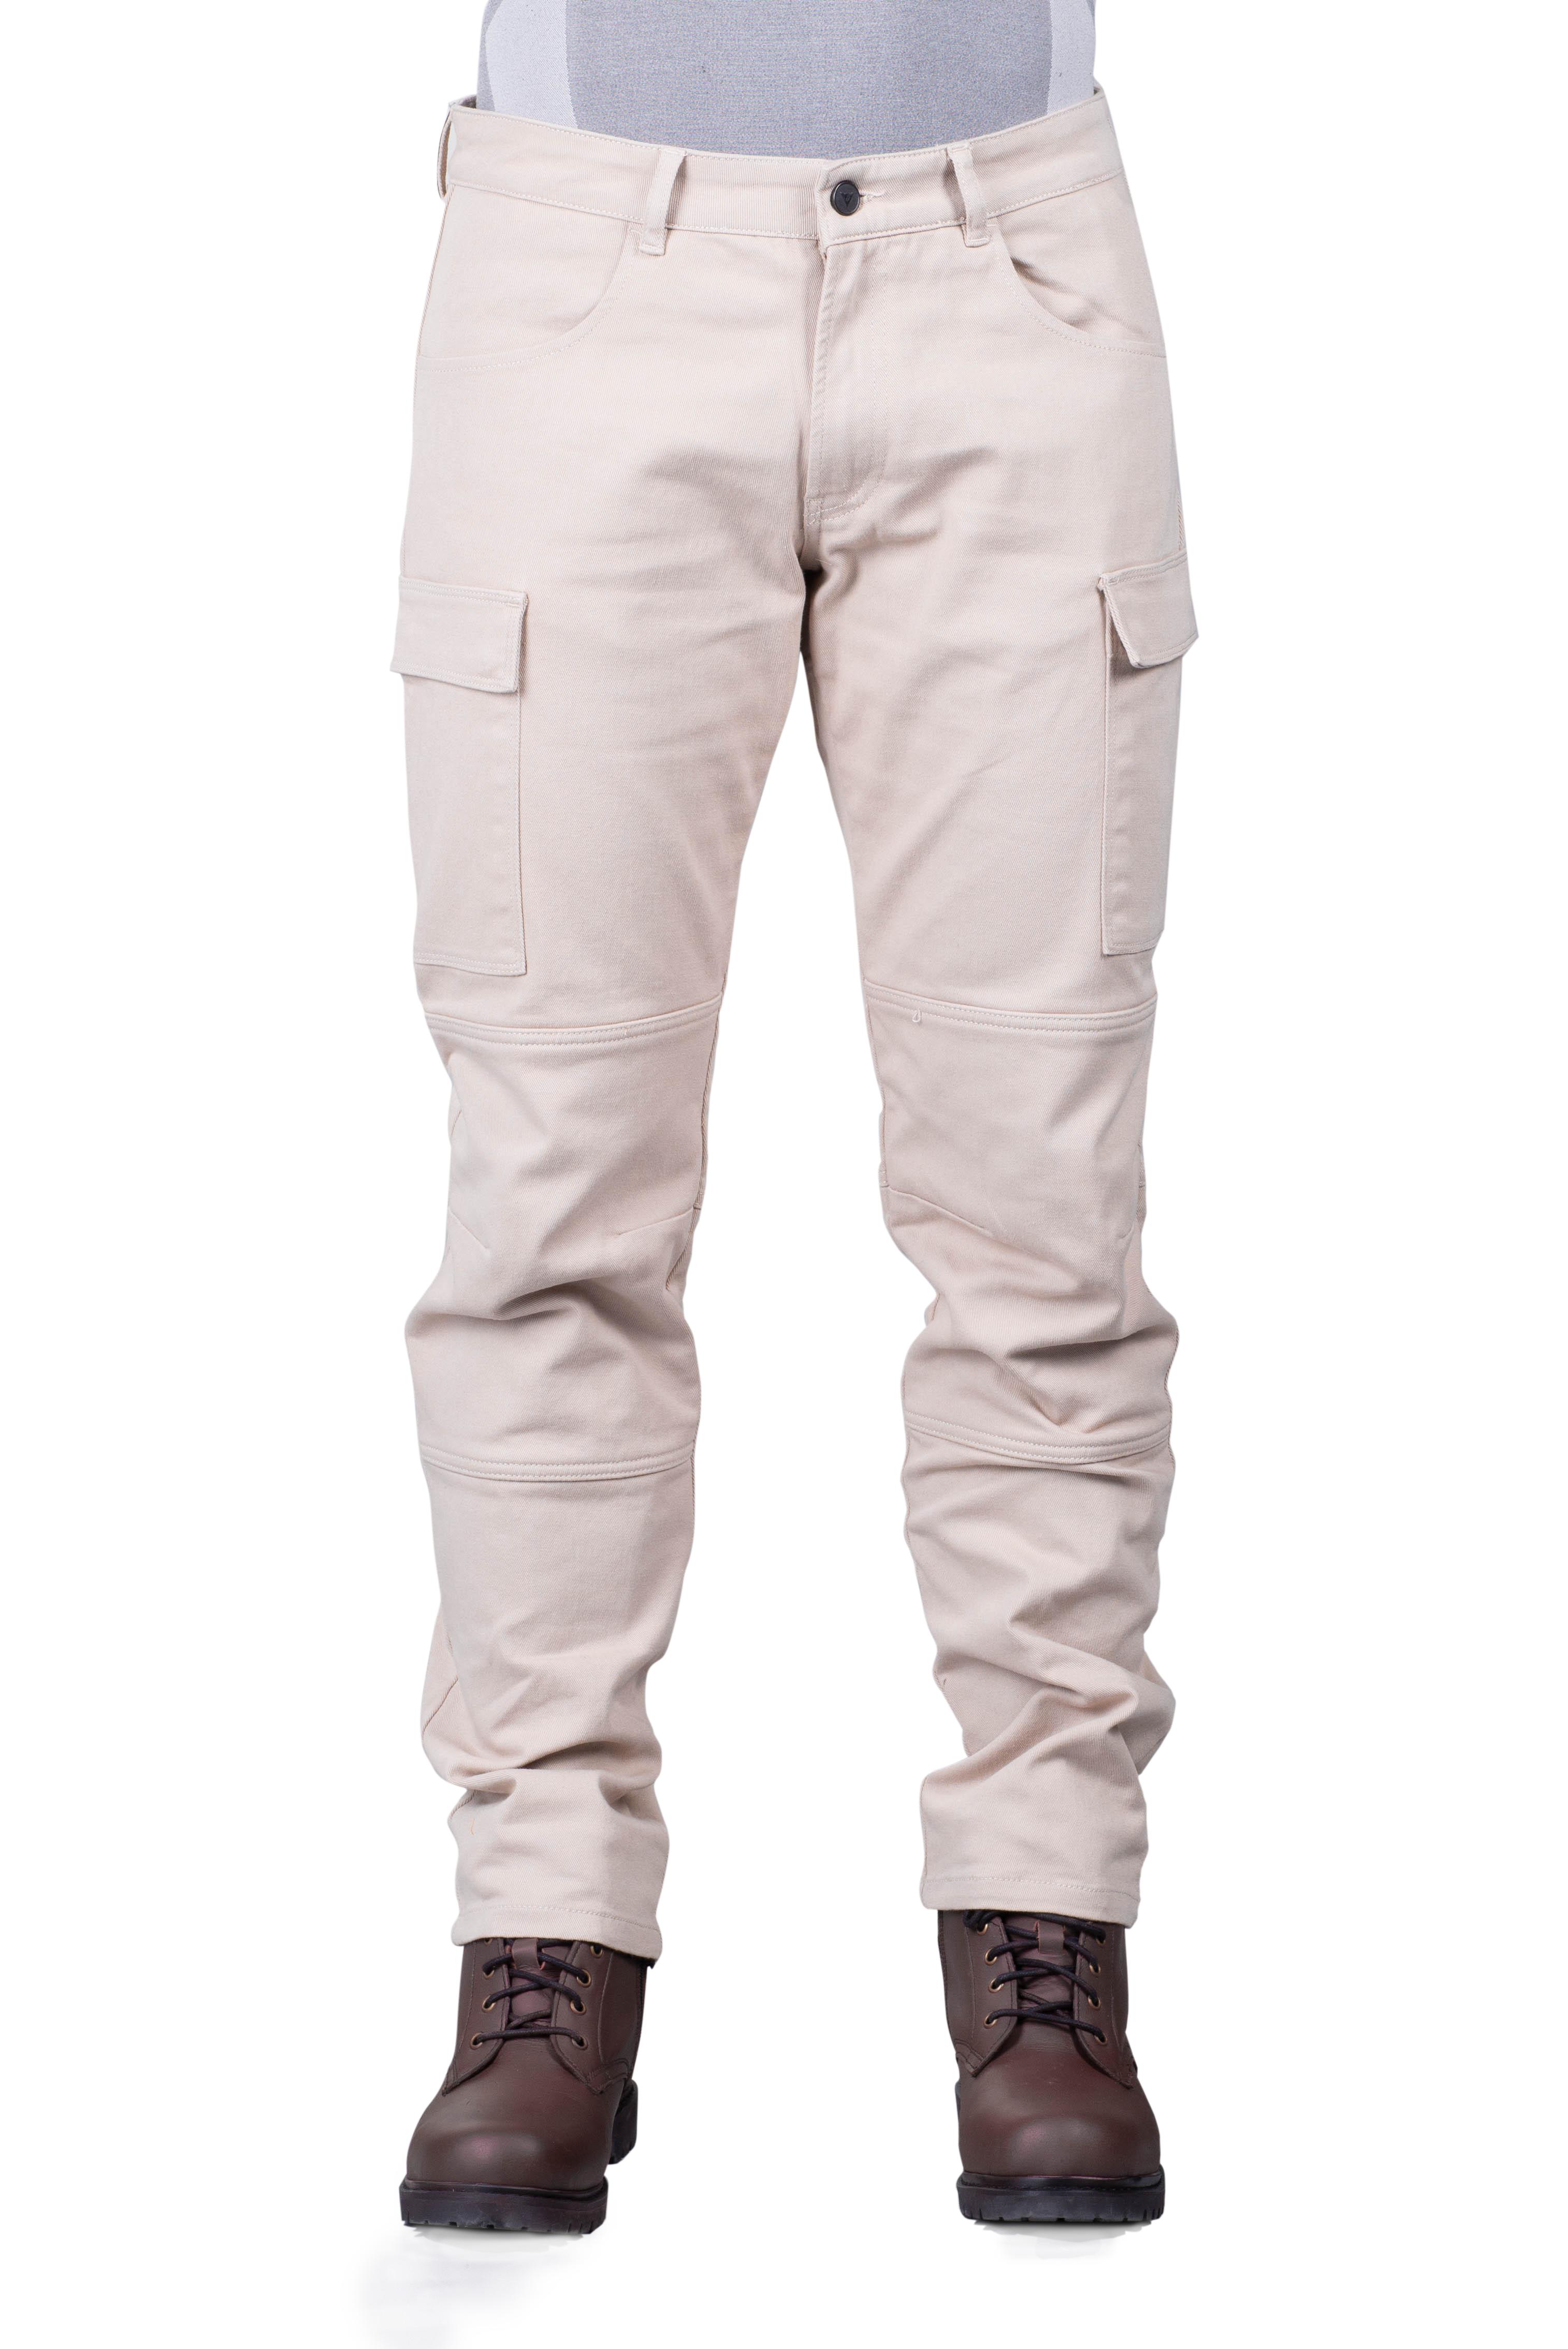 Dainese Jeans Moto  Atar Grigio Piuma